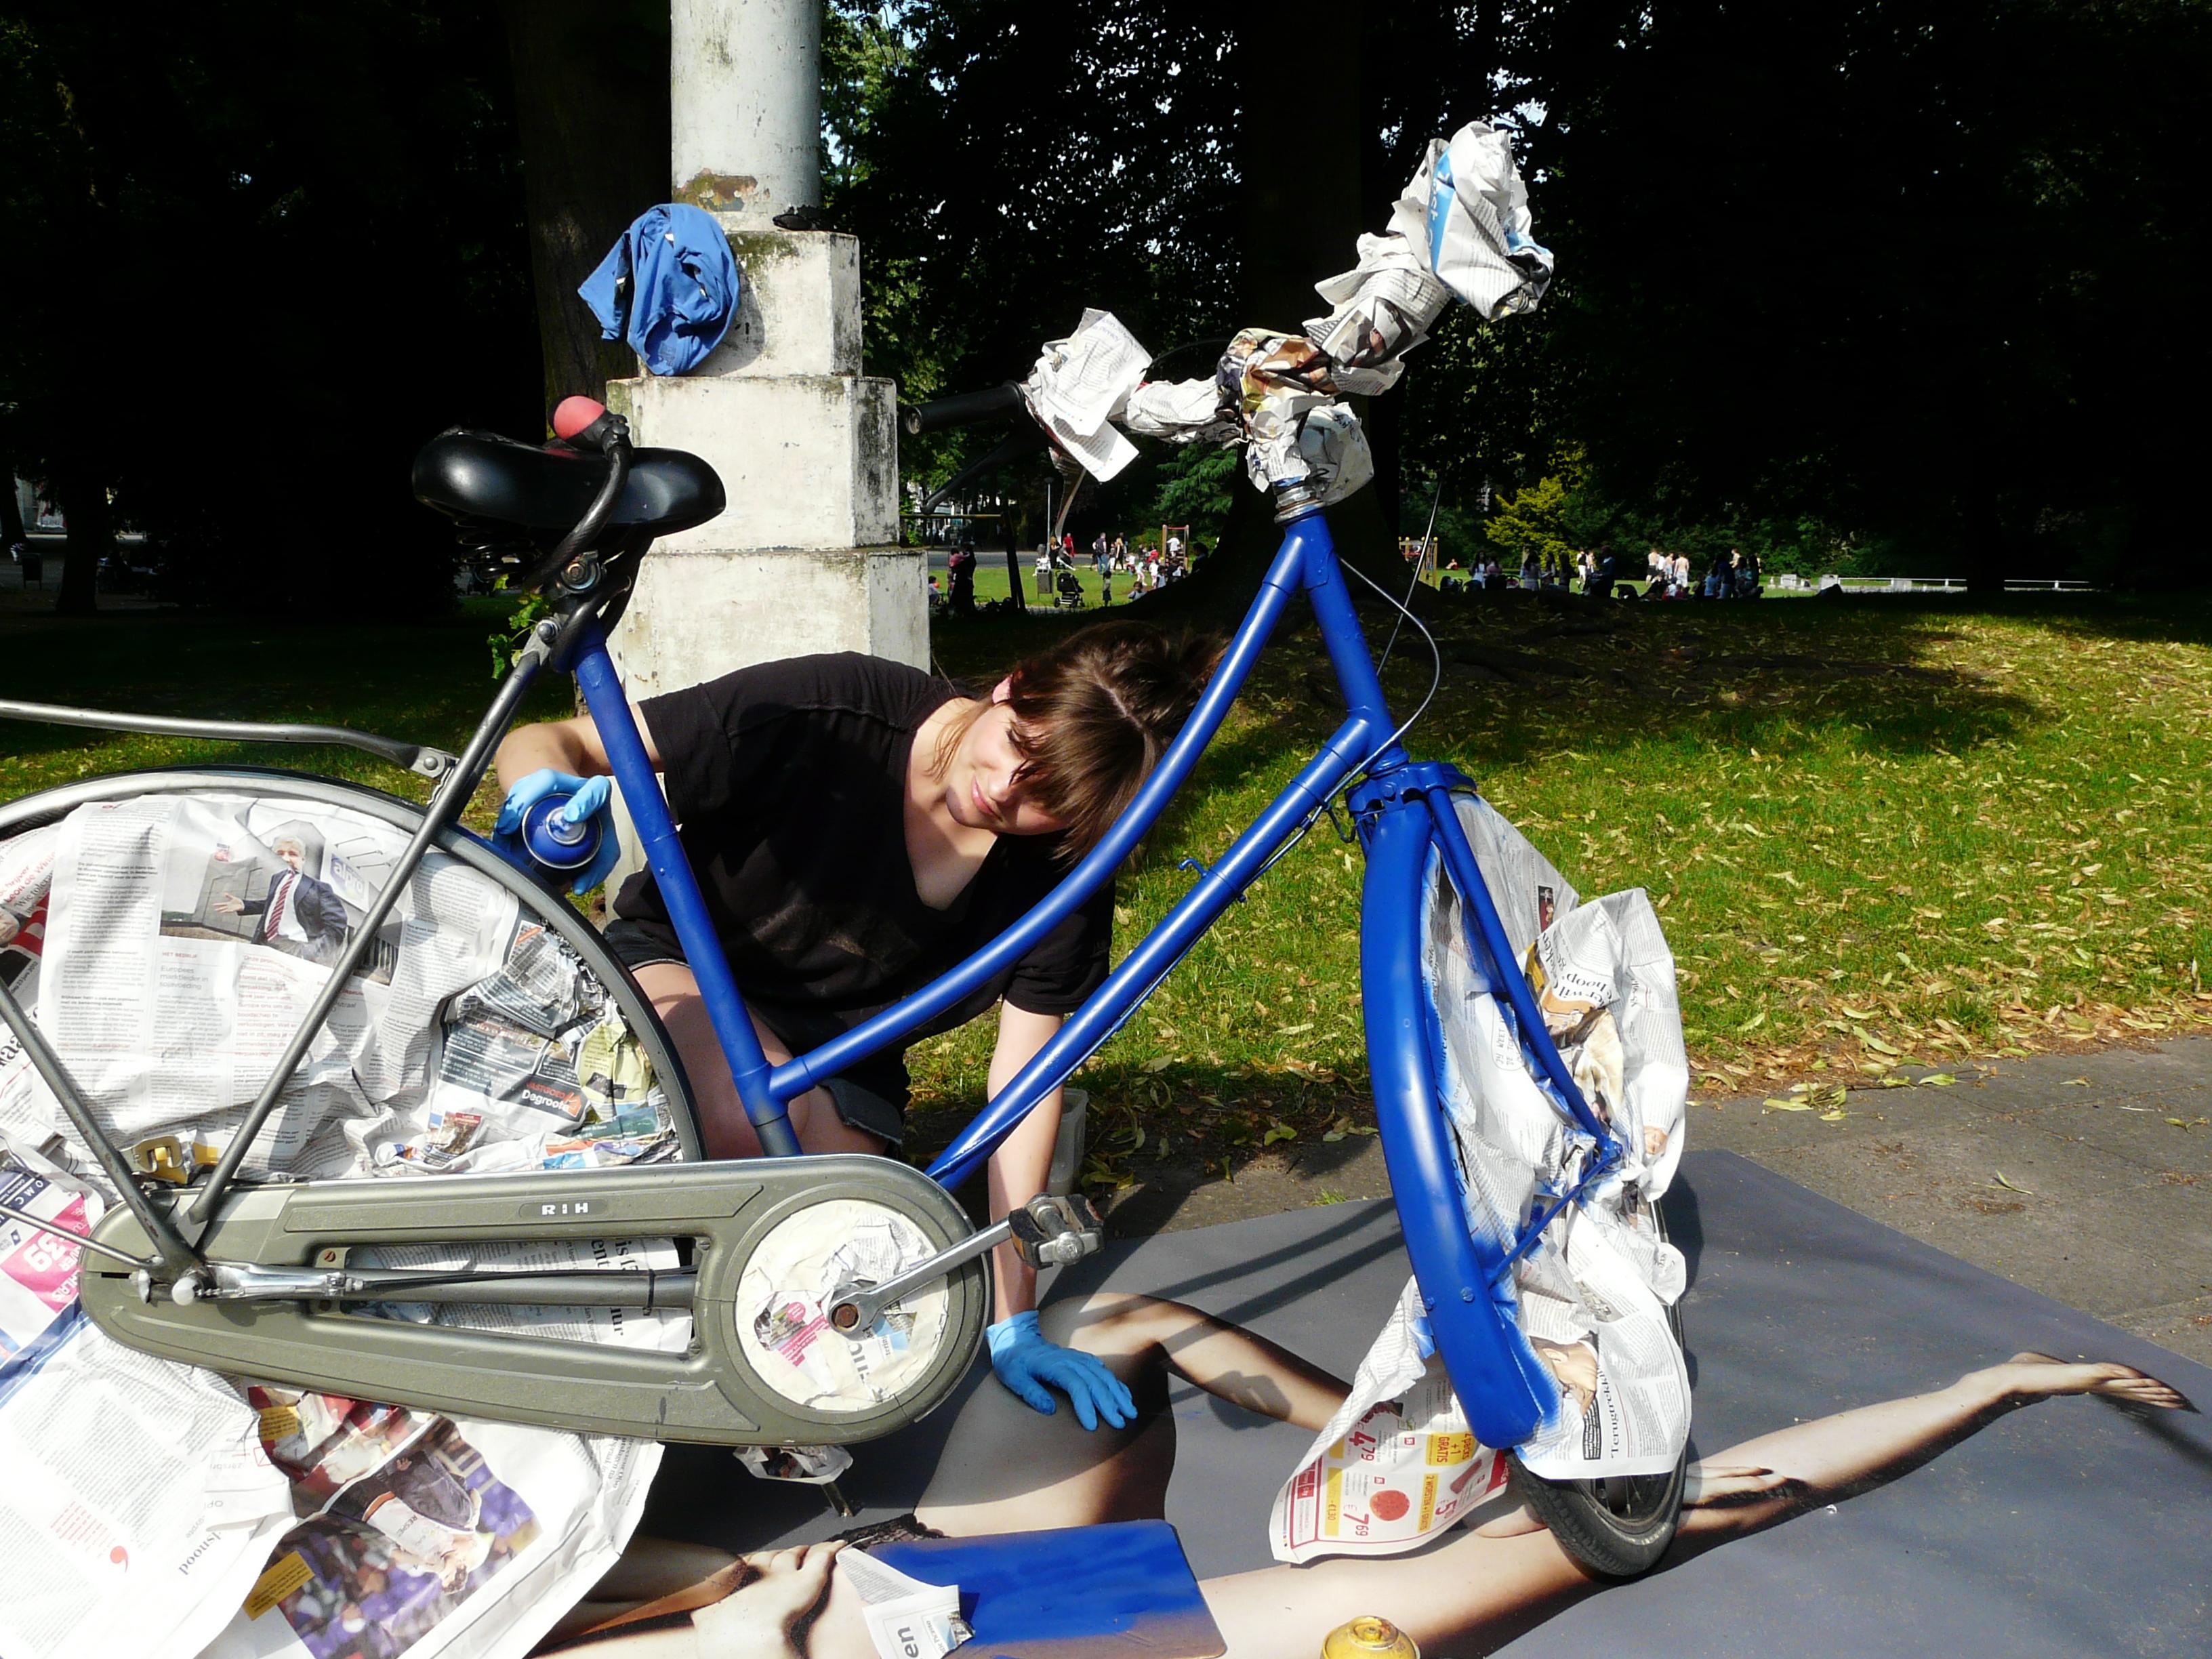 Paint your bike